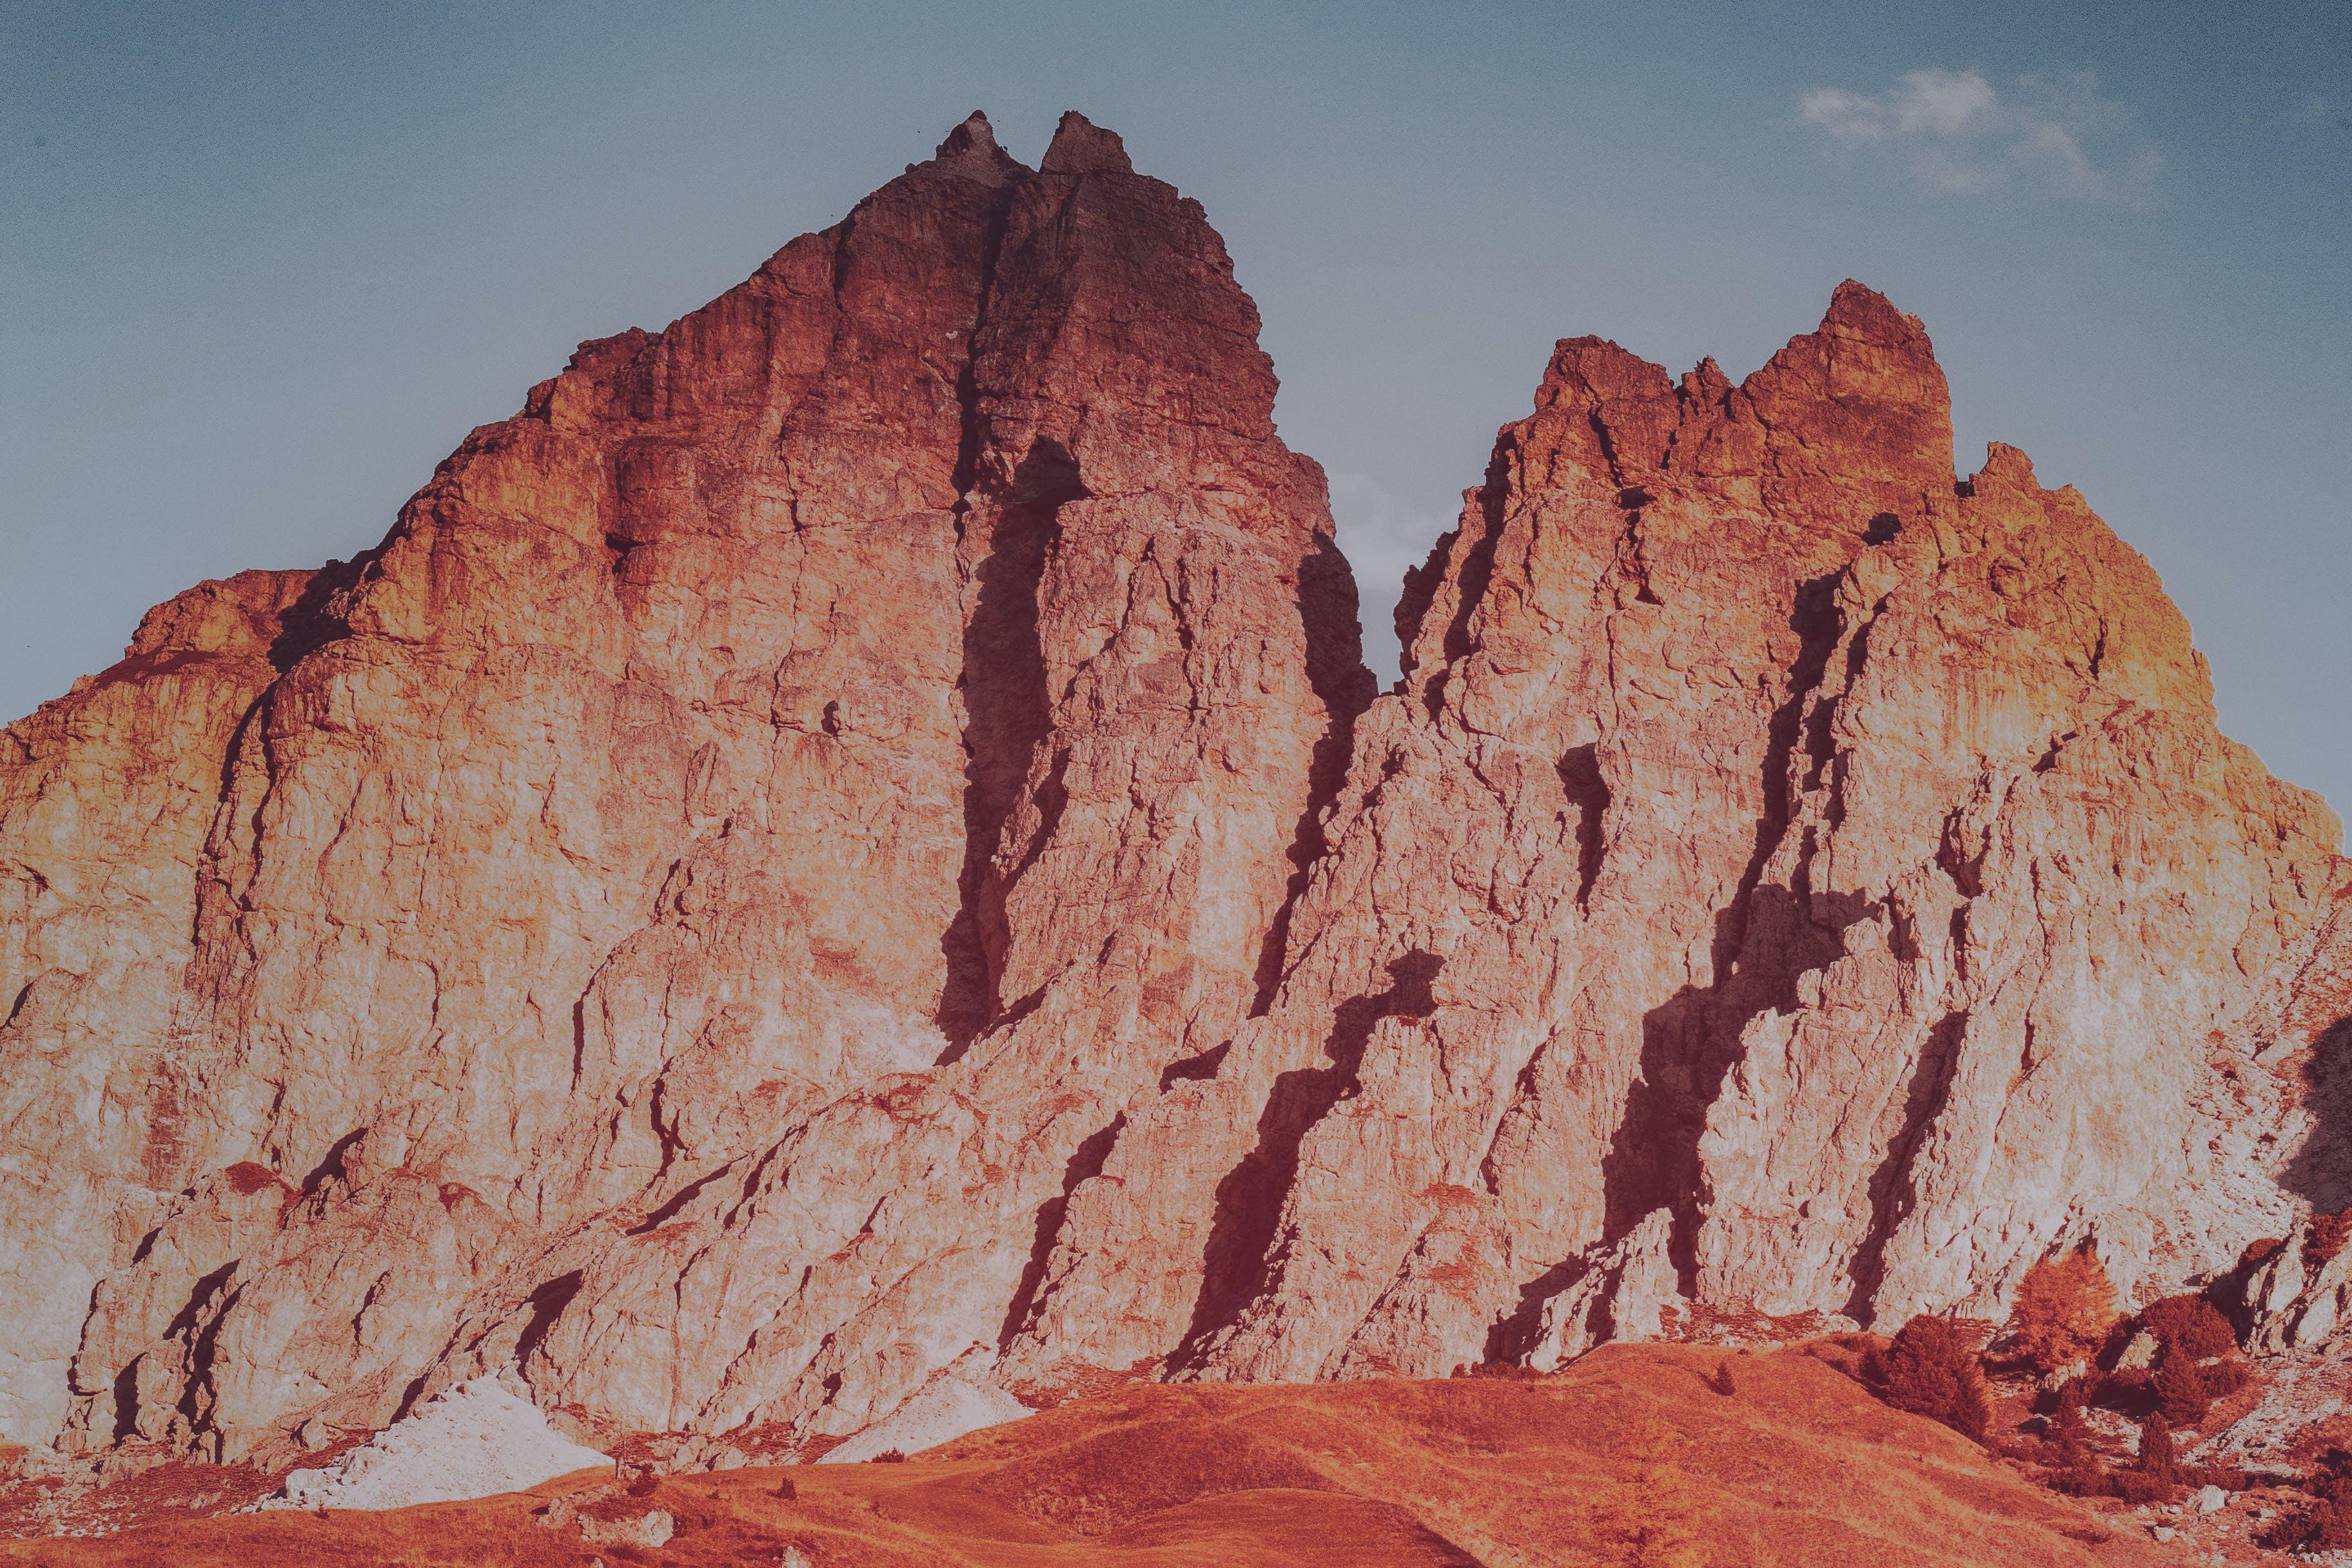 Brown Rocky Outcrop